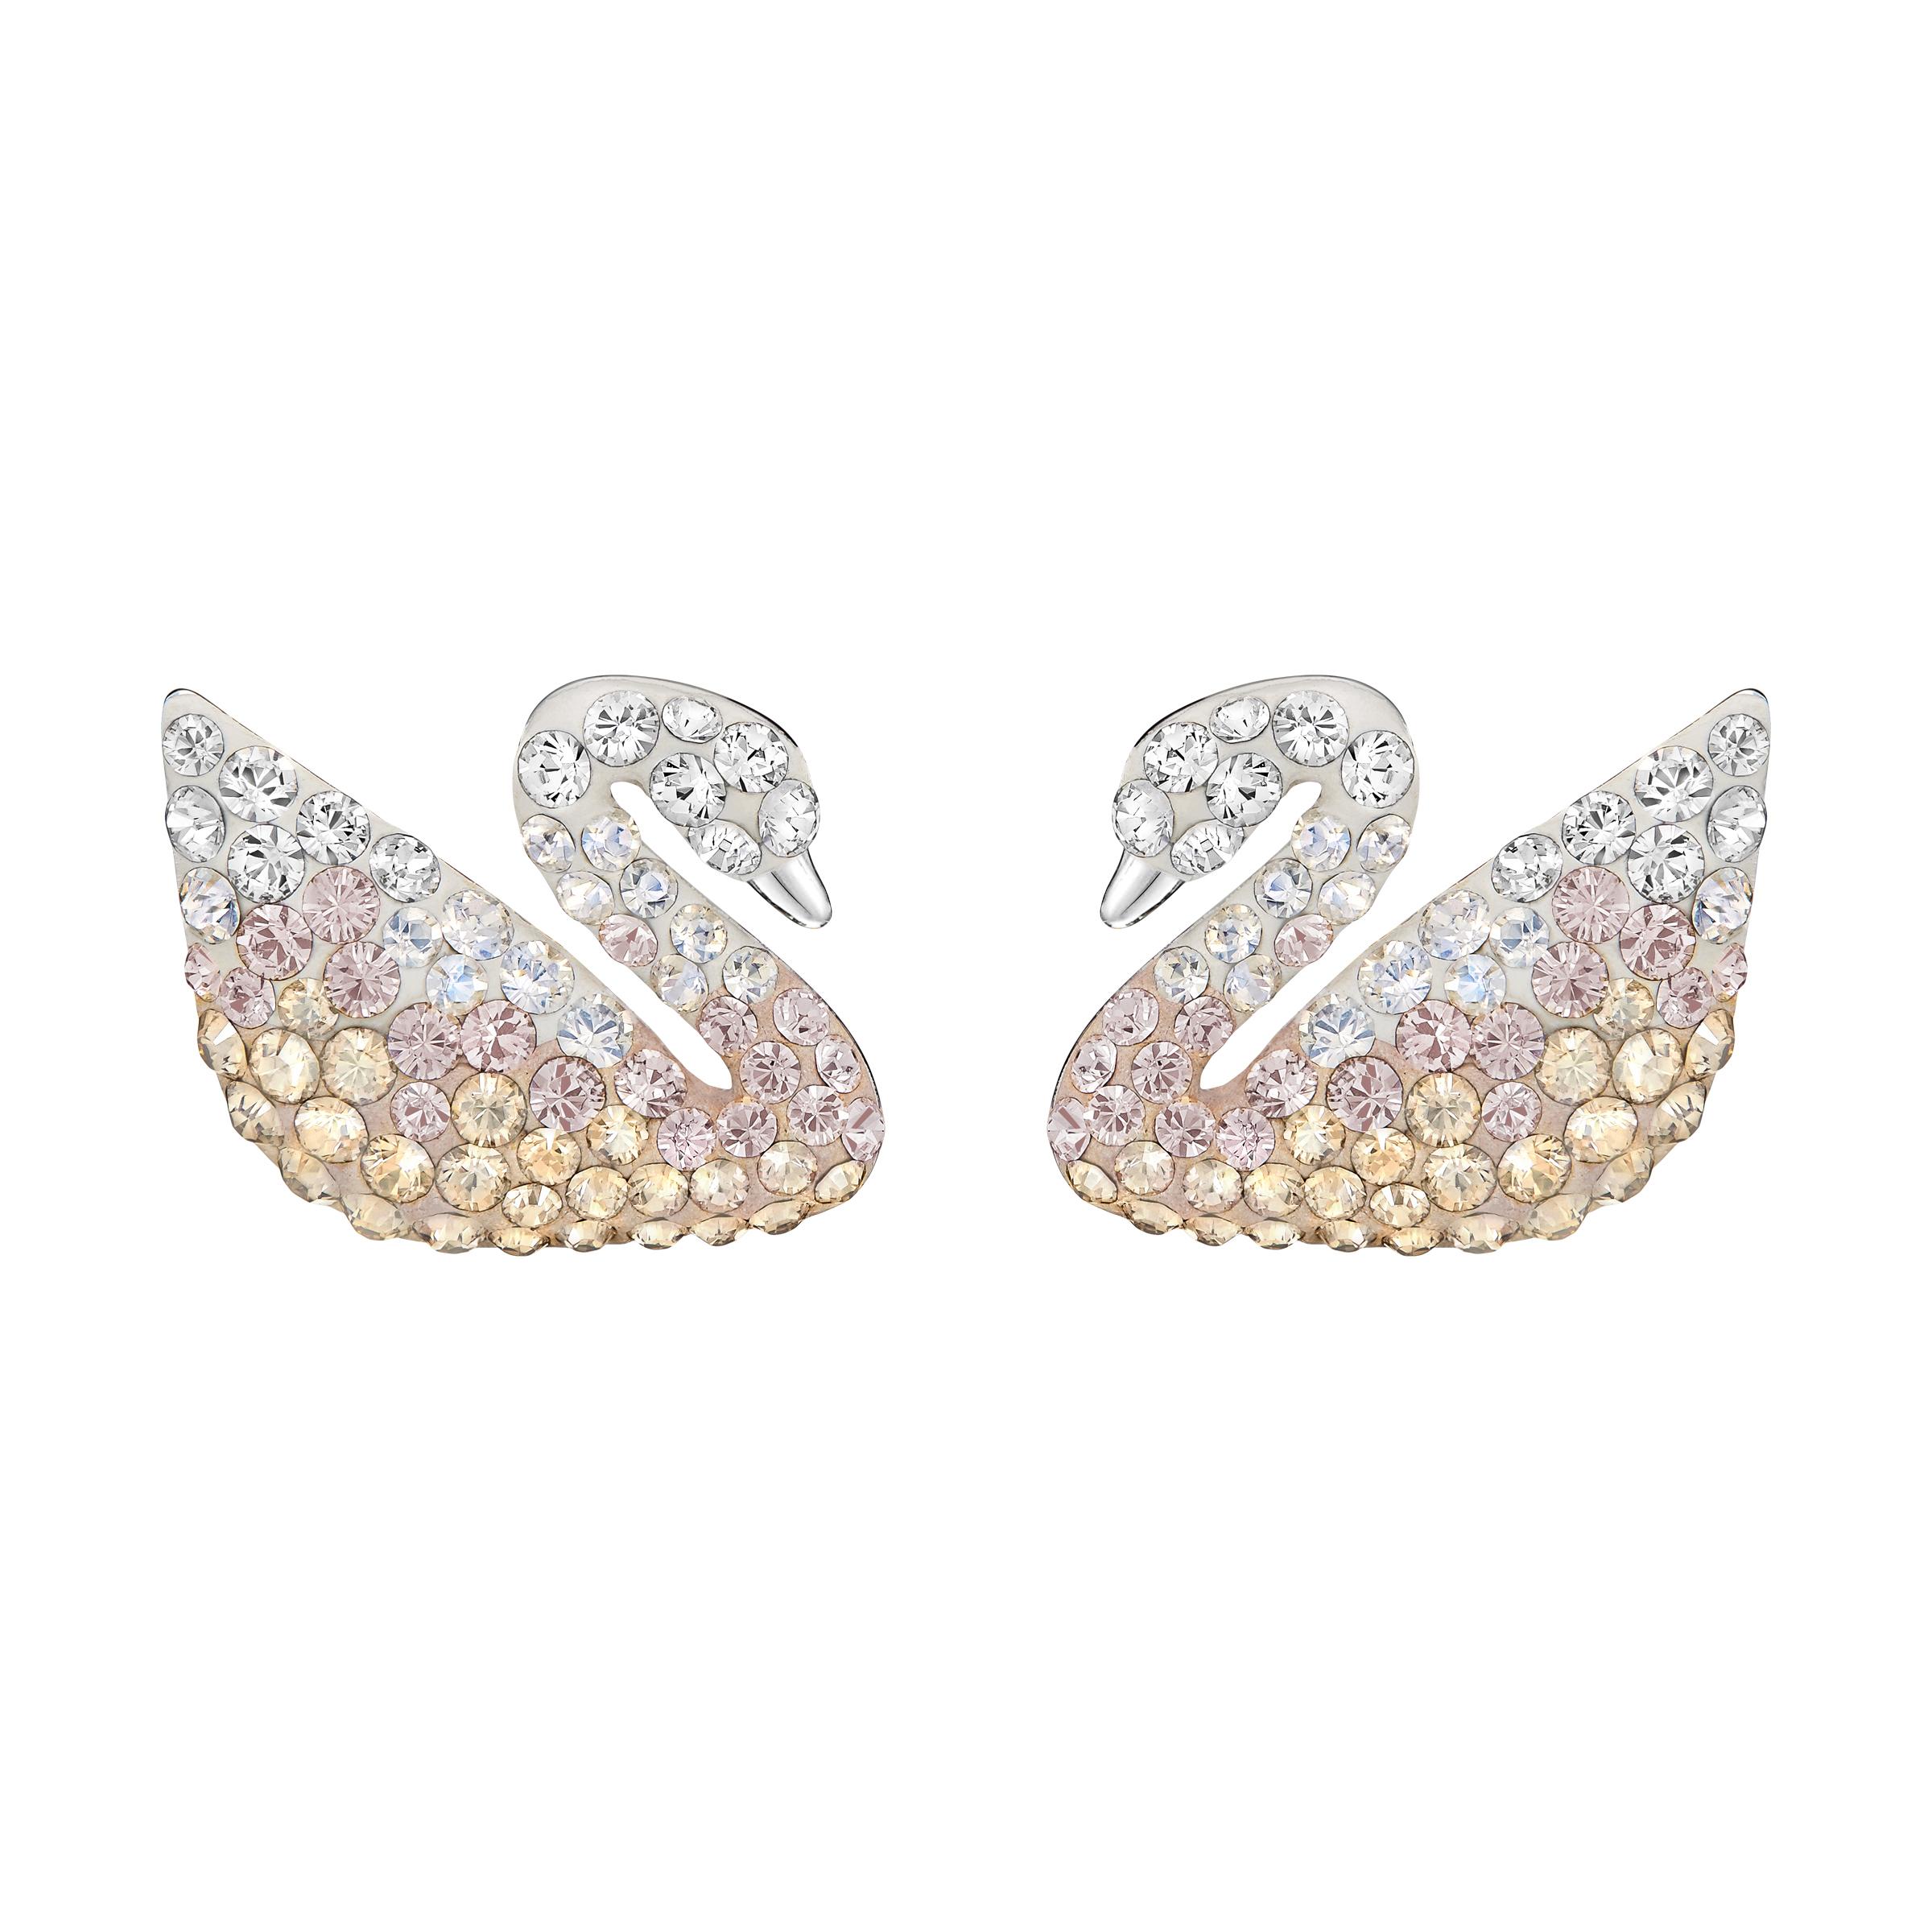 Boucles d'oreilles Swarovski Iconic Swan, multicolore, Métal rhodié, Swarovski